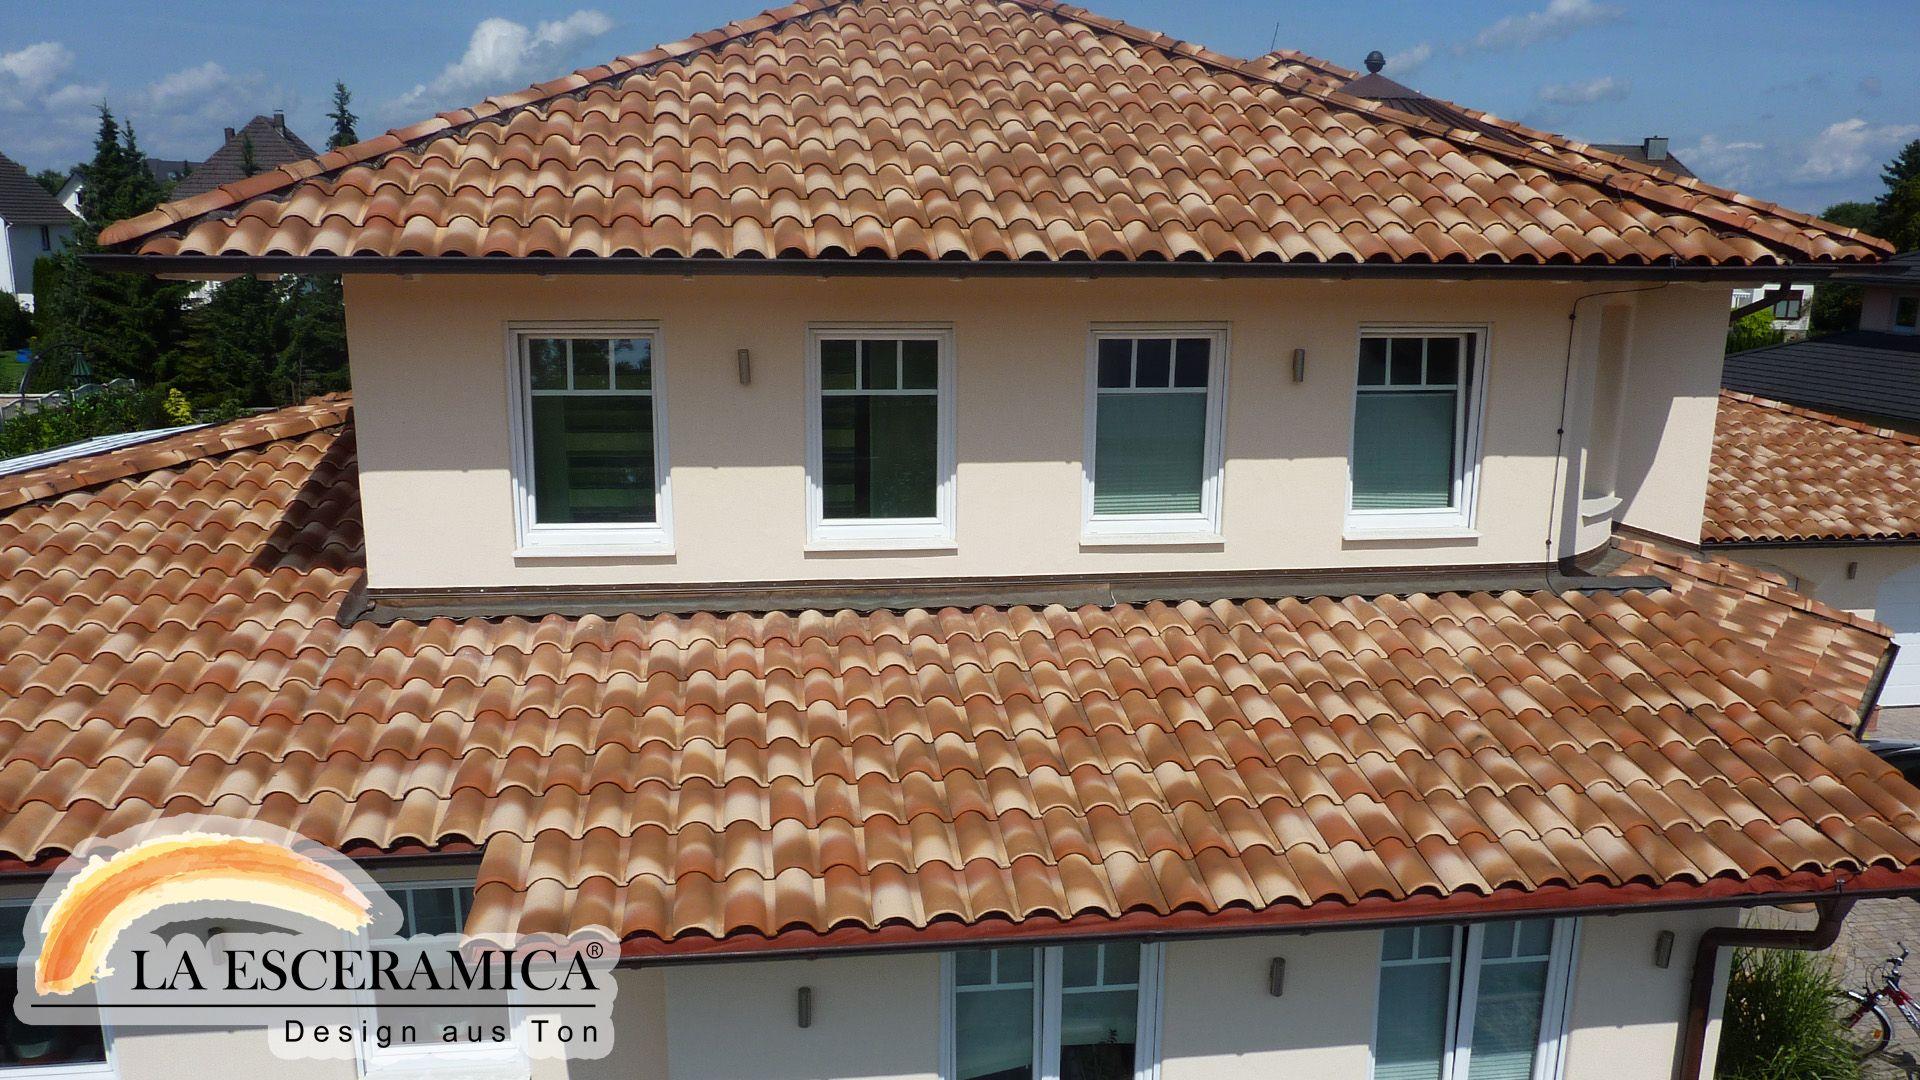 Dachziegel farben  La Esceramica Dachziegel Farbe Strohgelb | Dachziegel | Pinterest ...